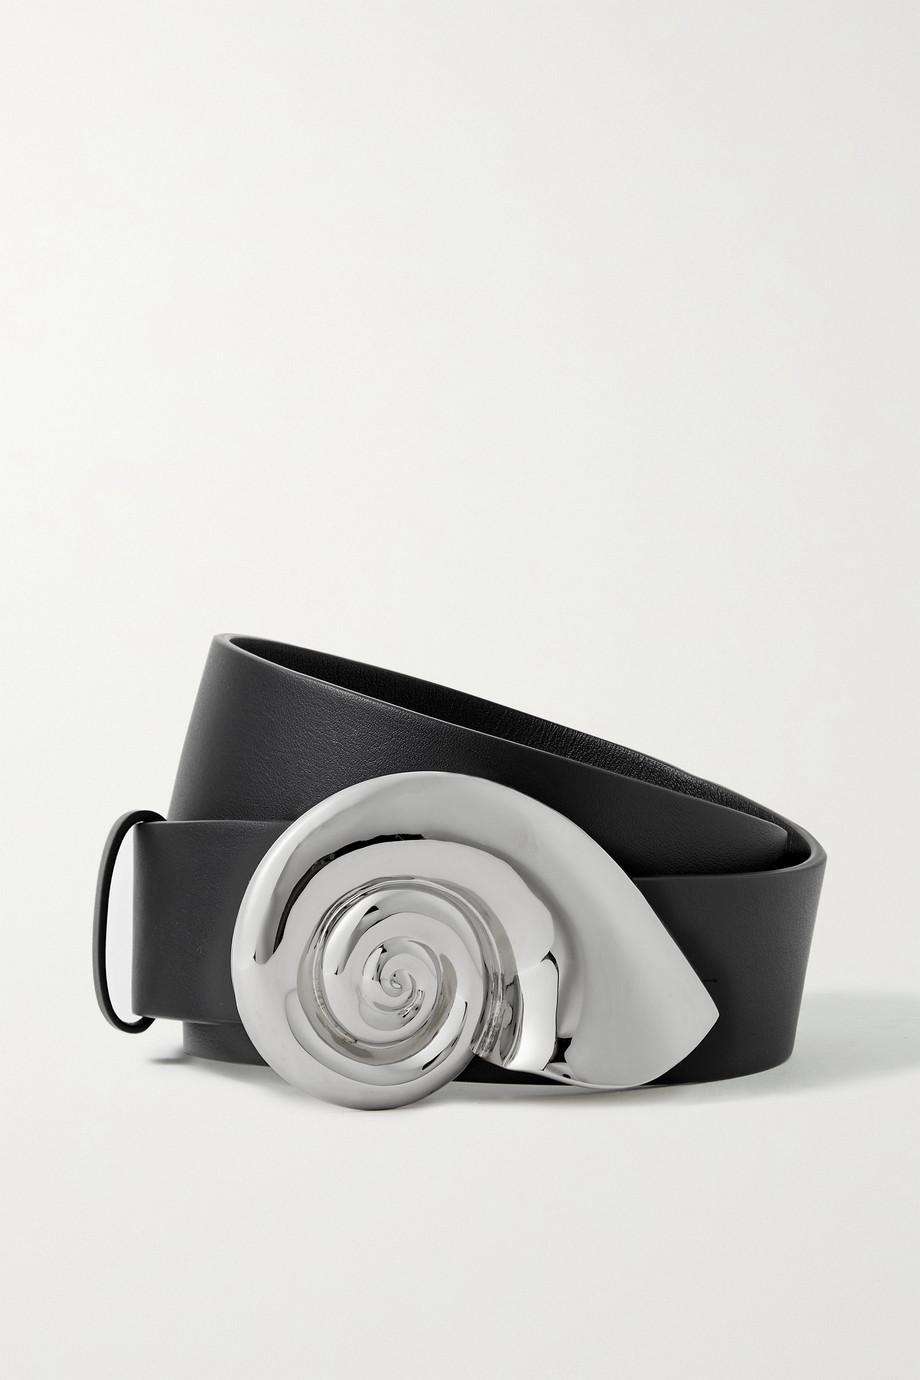 Gabriela Hearst Golden Ratio leather belt